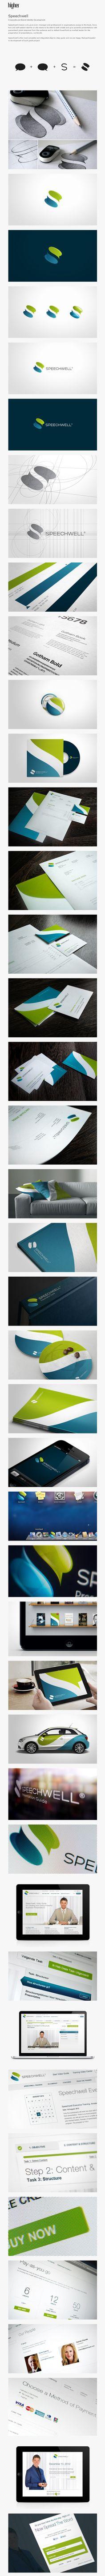 Speechwell | #stationary #corporate #design #corporatedesign #identity #branding #marketing < repinned by www.BlickeDeeler.de | Take a look at www.LogoGestaltung-Hamburg.de